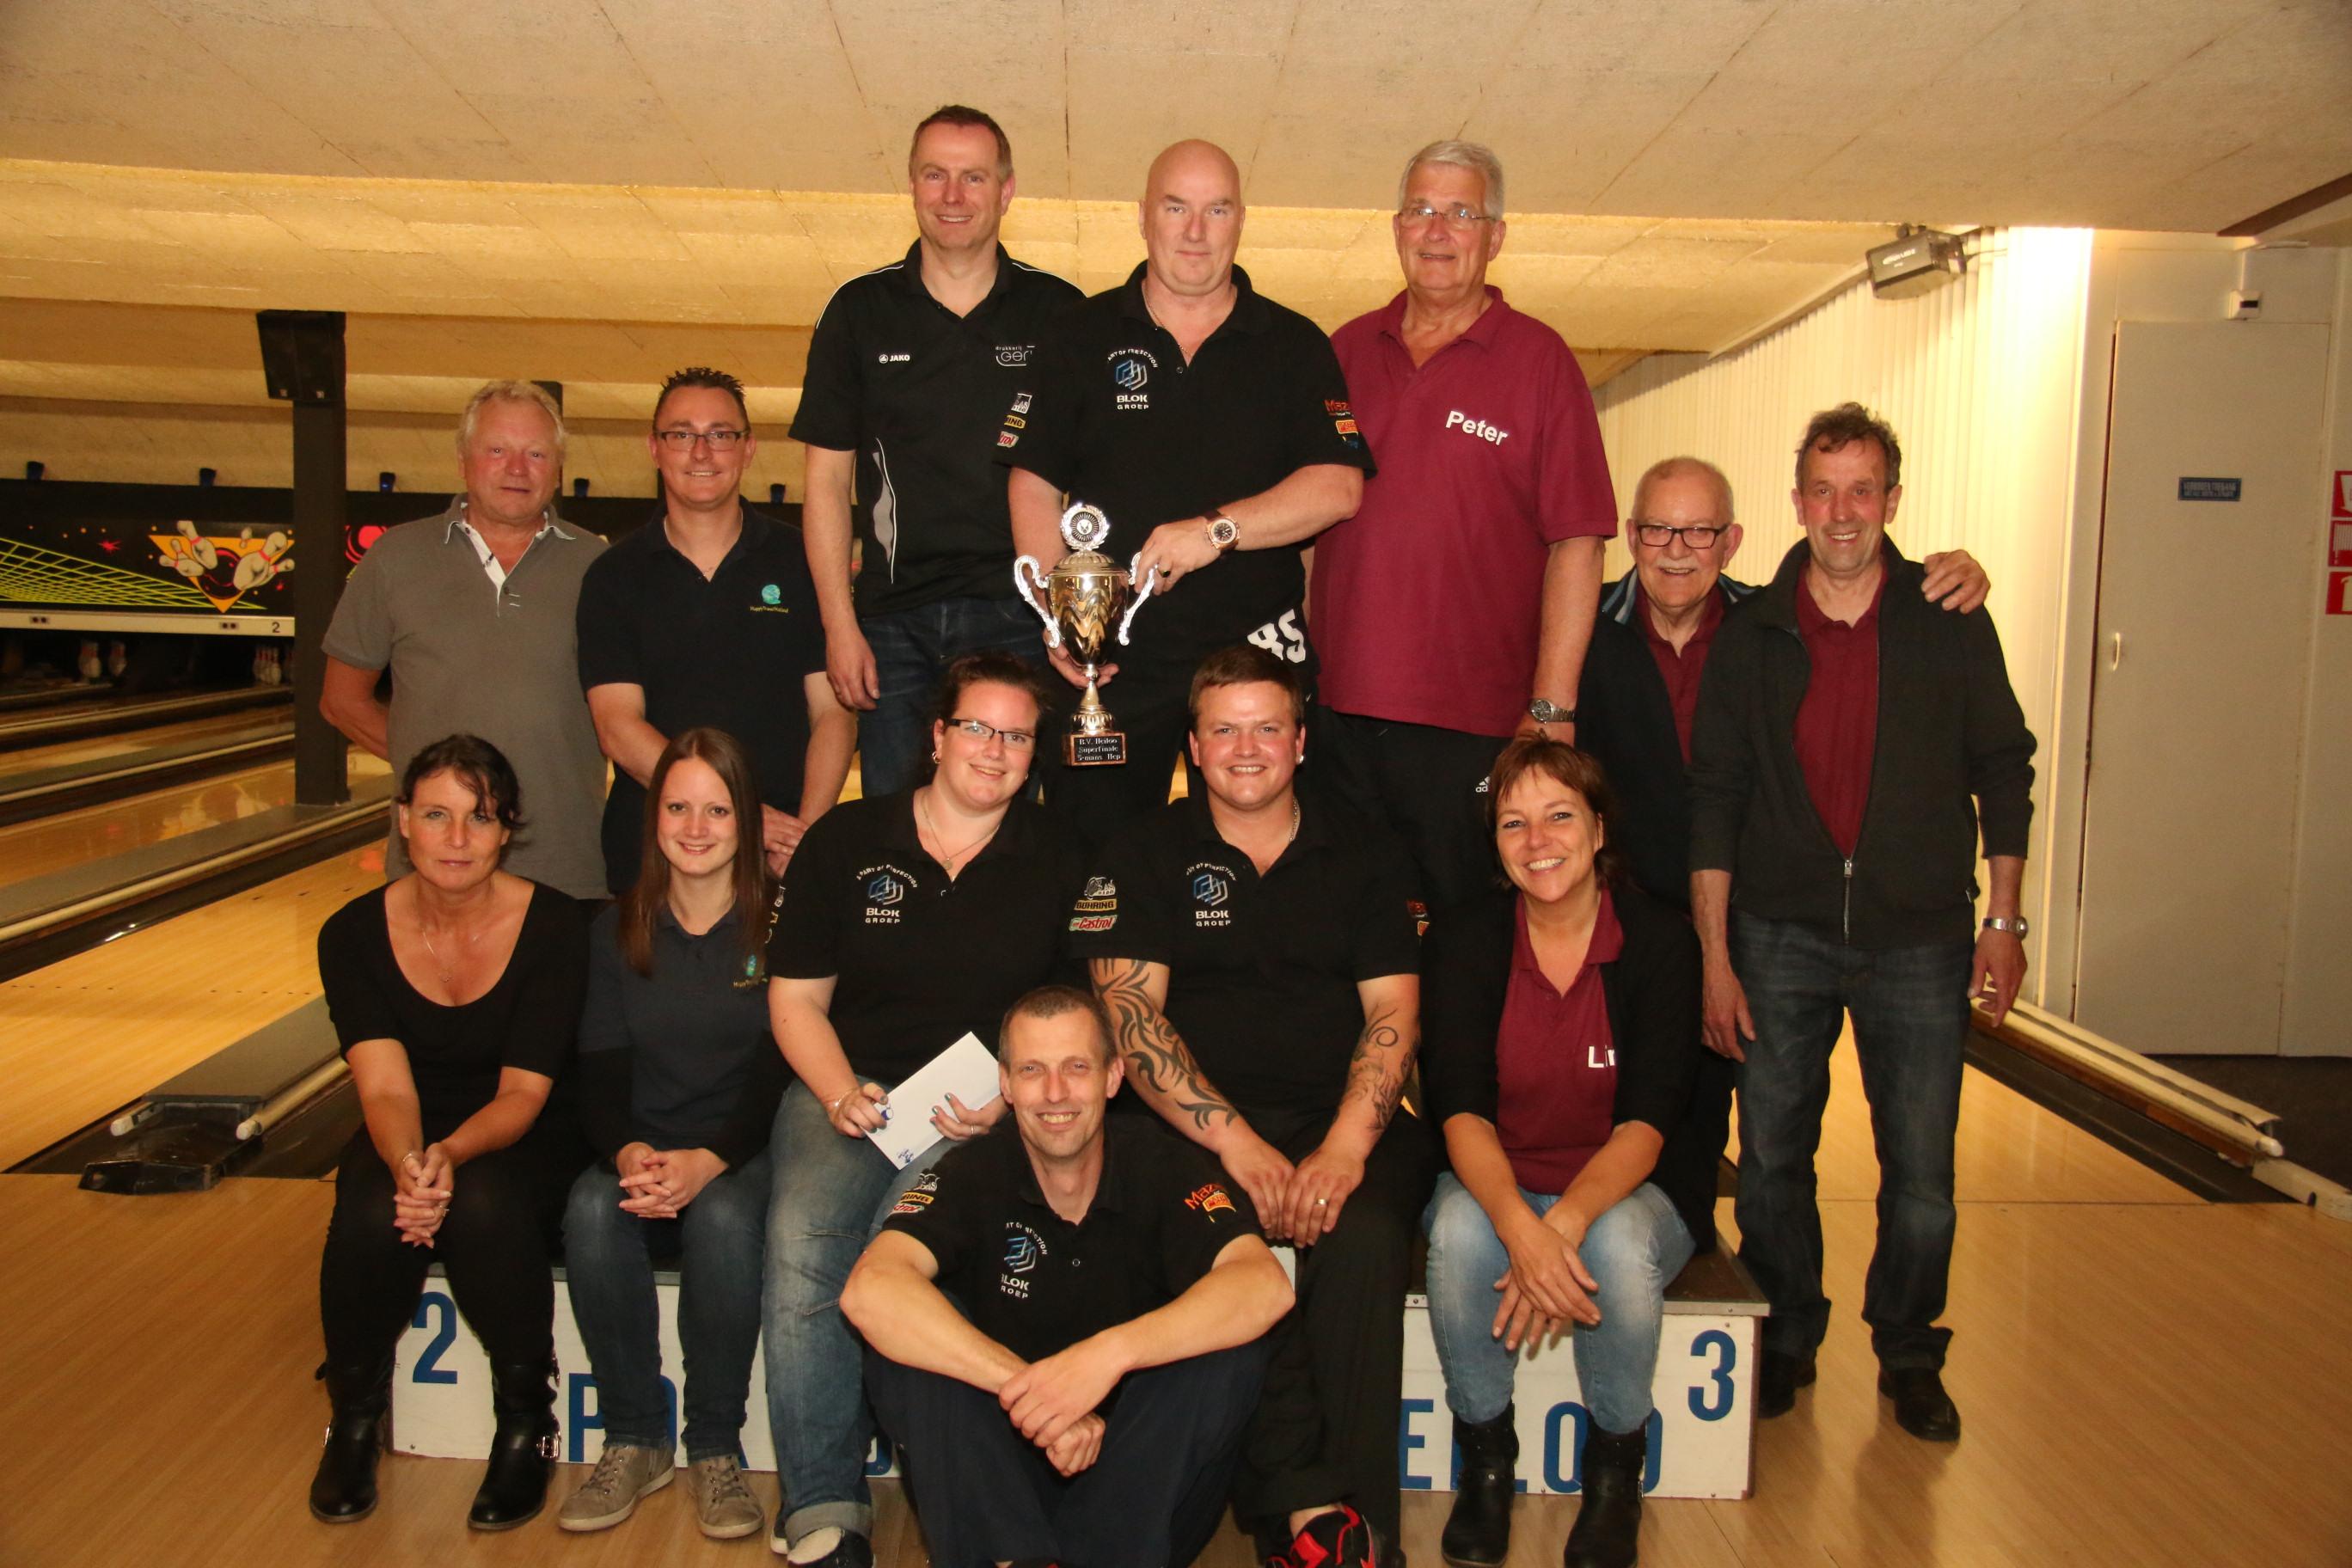 http://www.bowlingverenigingheiloo.nl/fotos_verhalen/foto's/2016_0524-SupFin-Hcp4.jpg